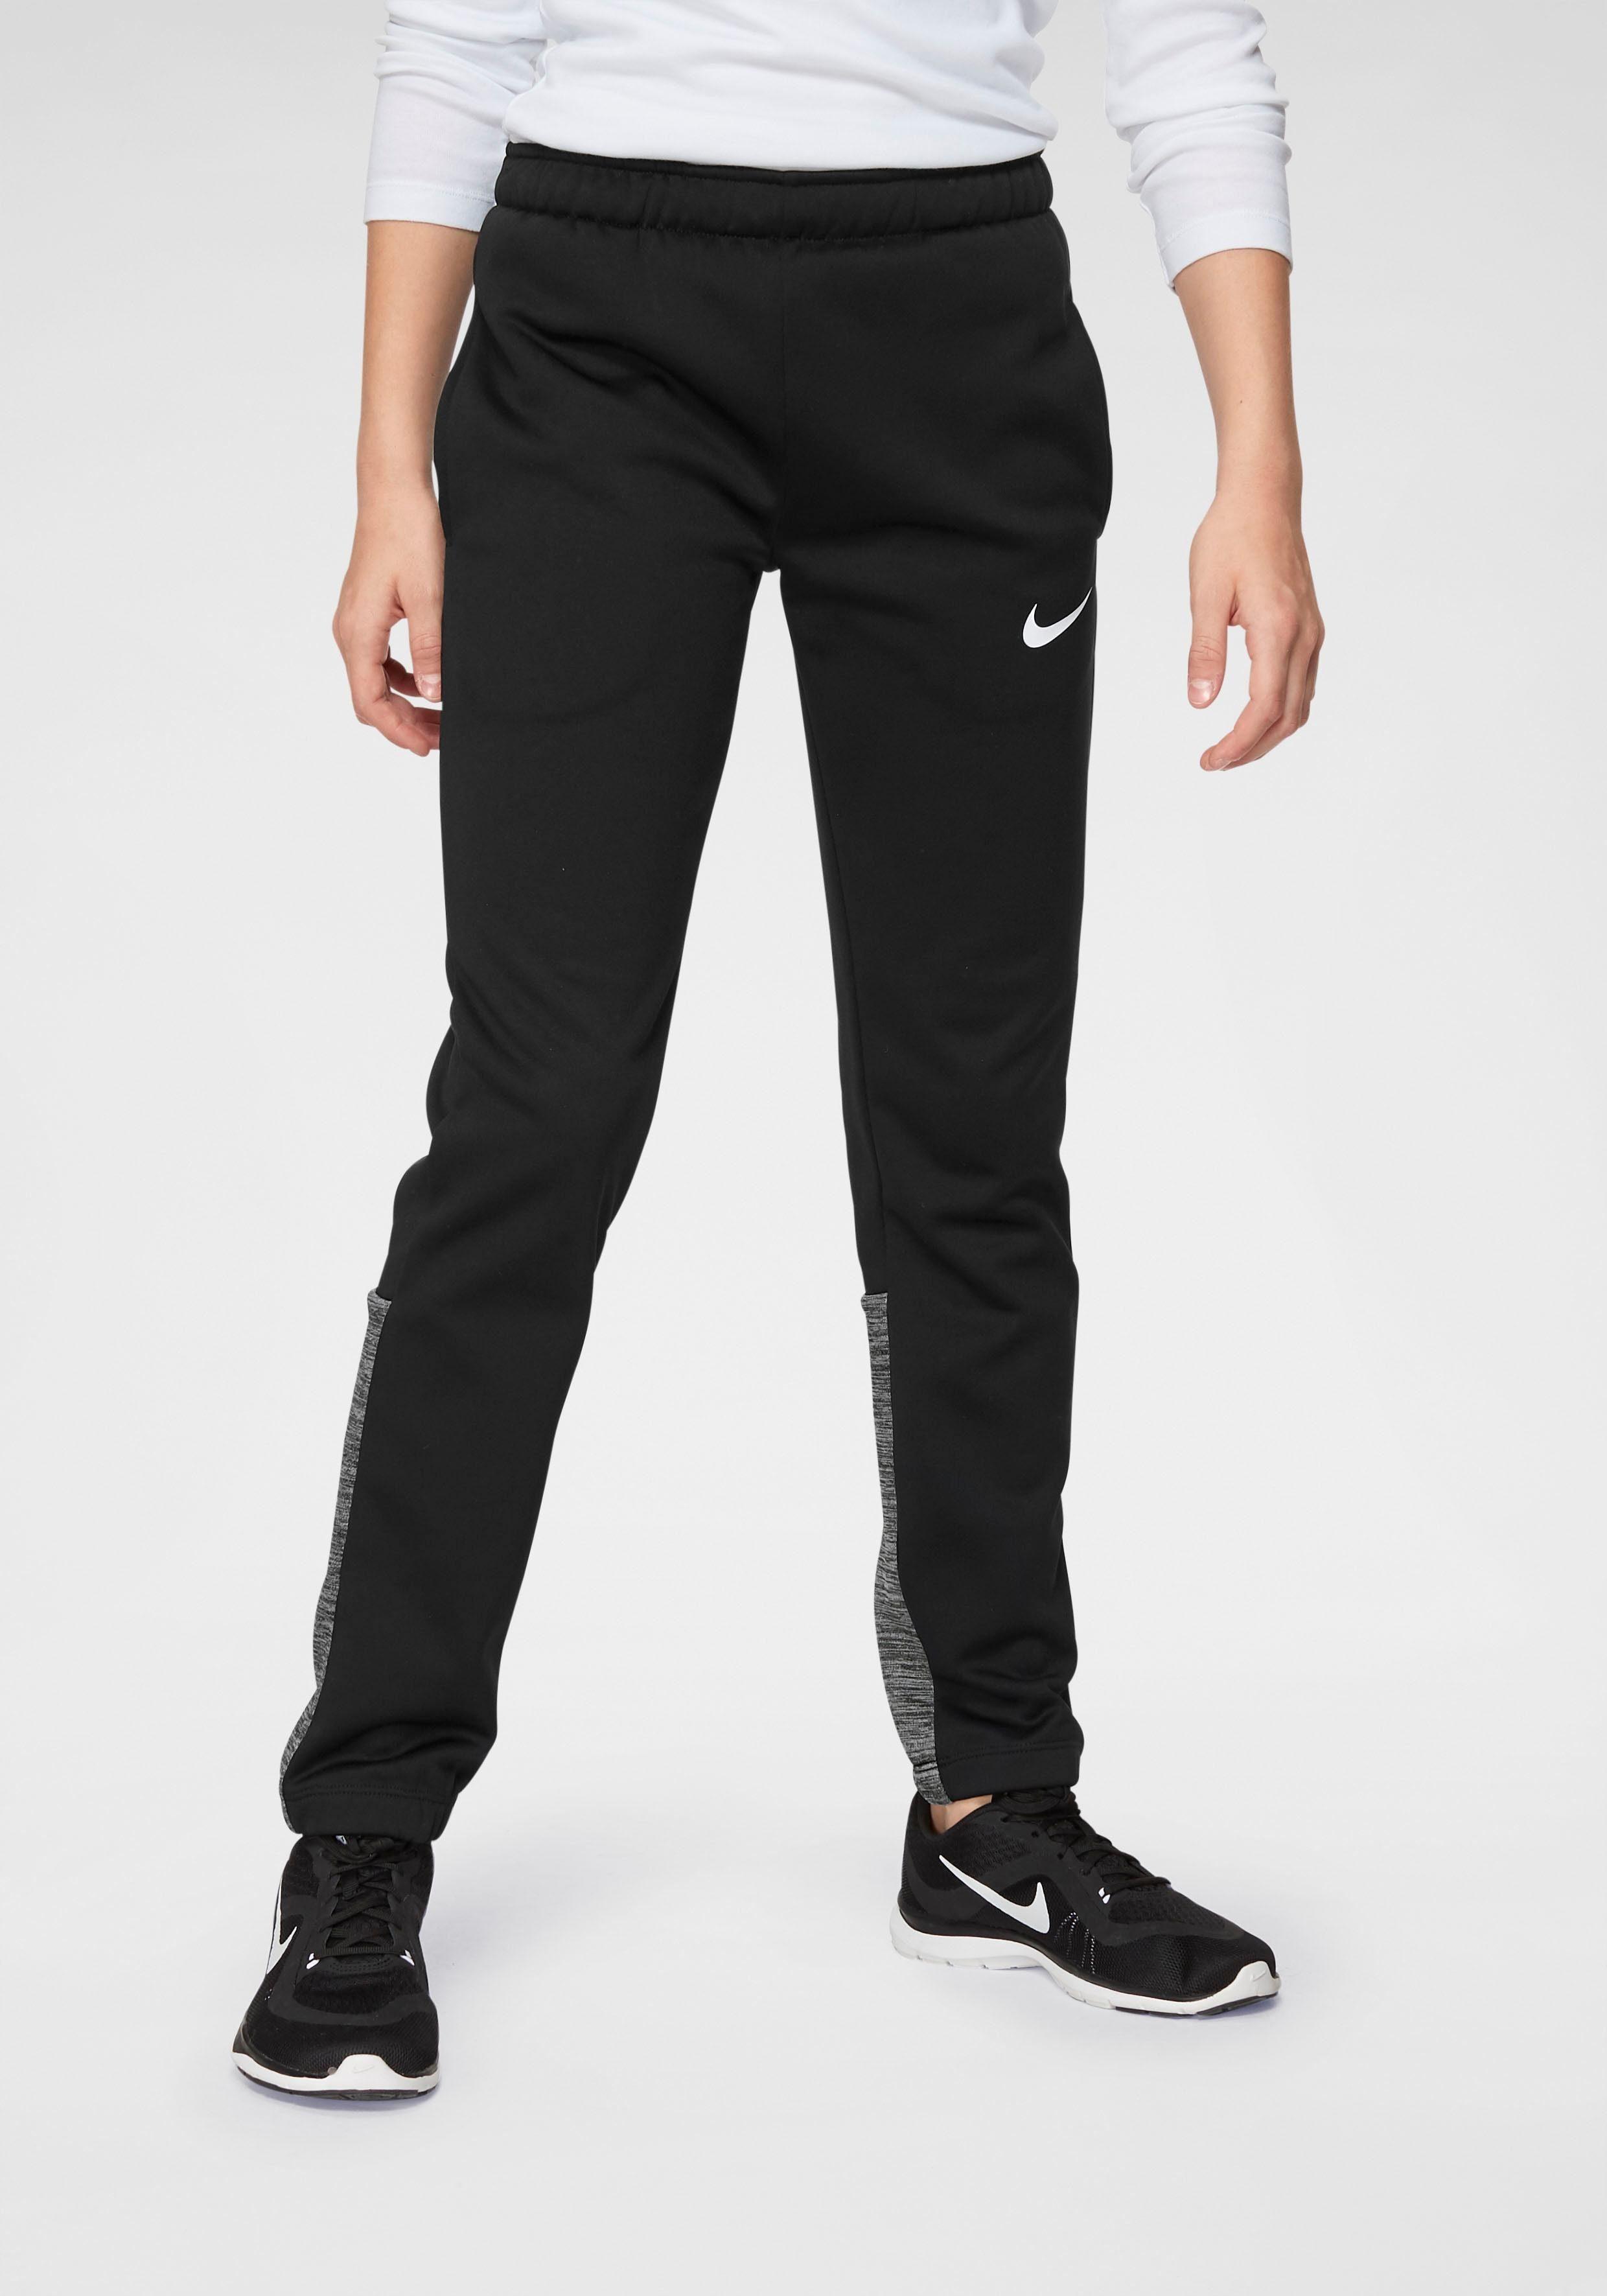 »NIKE TRAINING OTTOSALE THERMA Damen Trainingshose Nike 5cAR34jLq